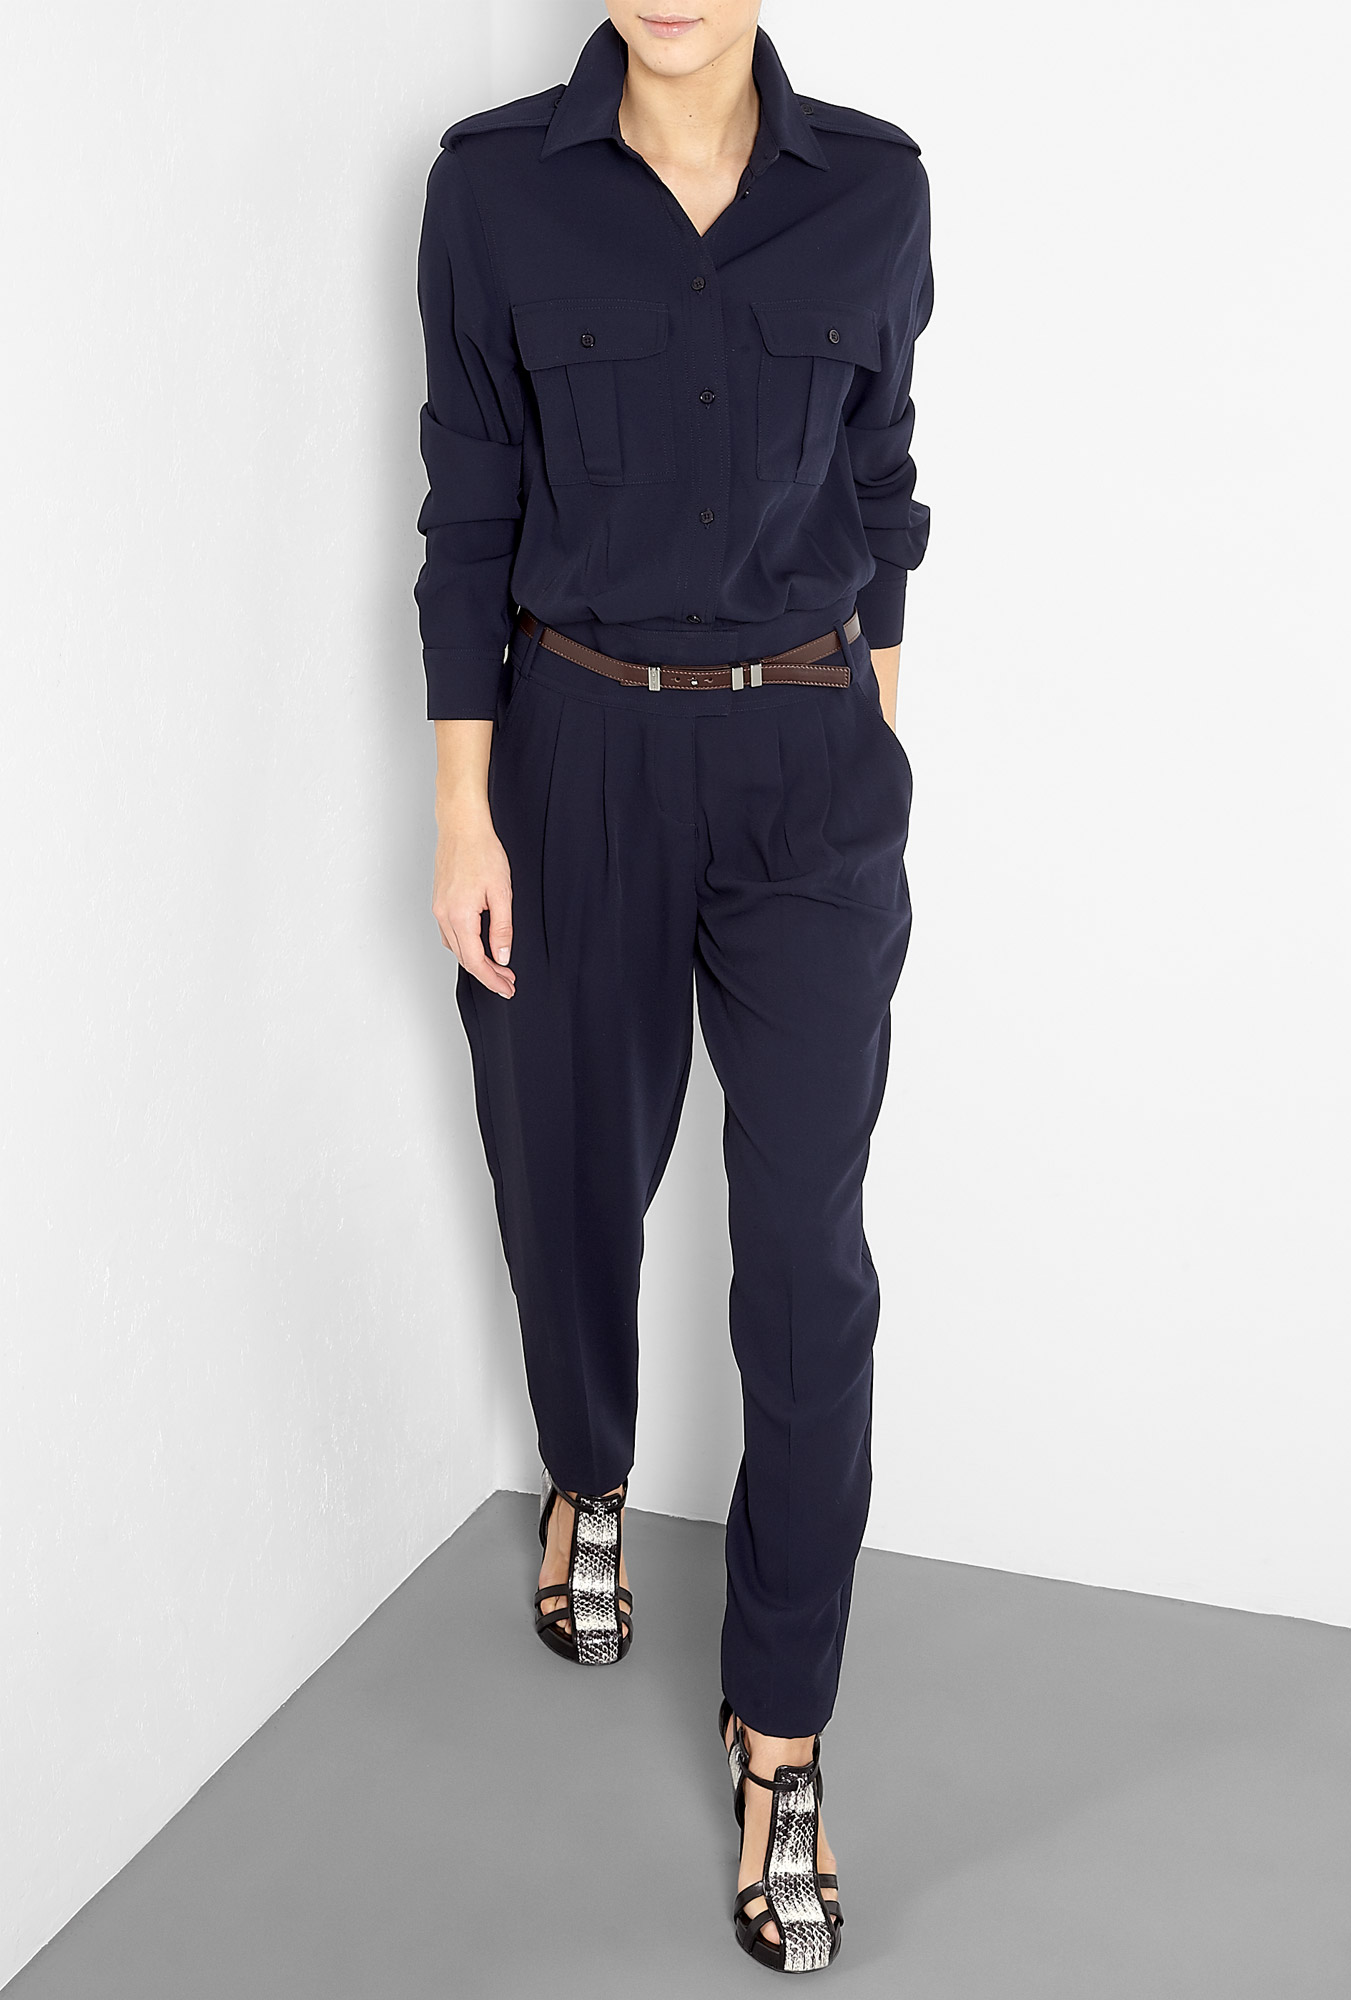 michael michael kors long sleeve pocketed navy jumpsuit in blue navy lyst. Black Bedroom Furniture Sets. Home Design Ideas